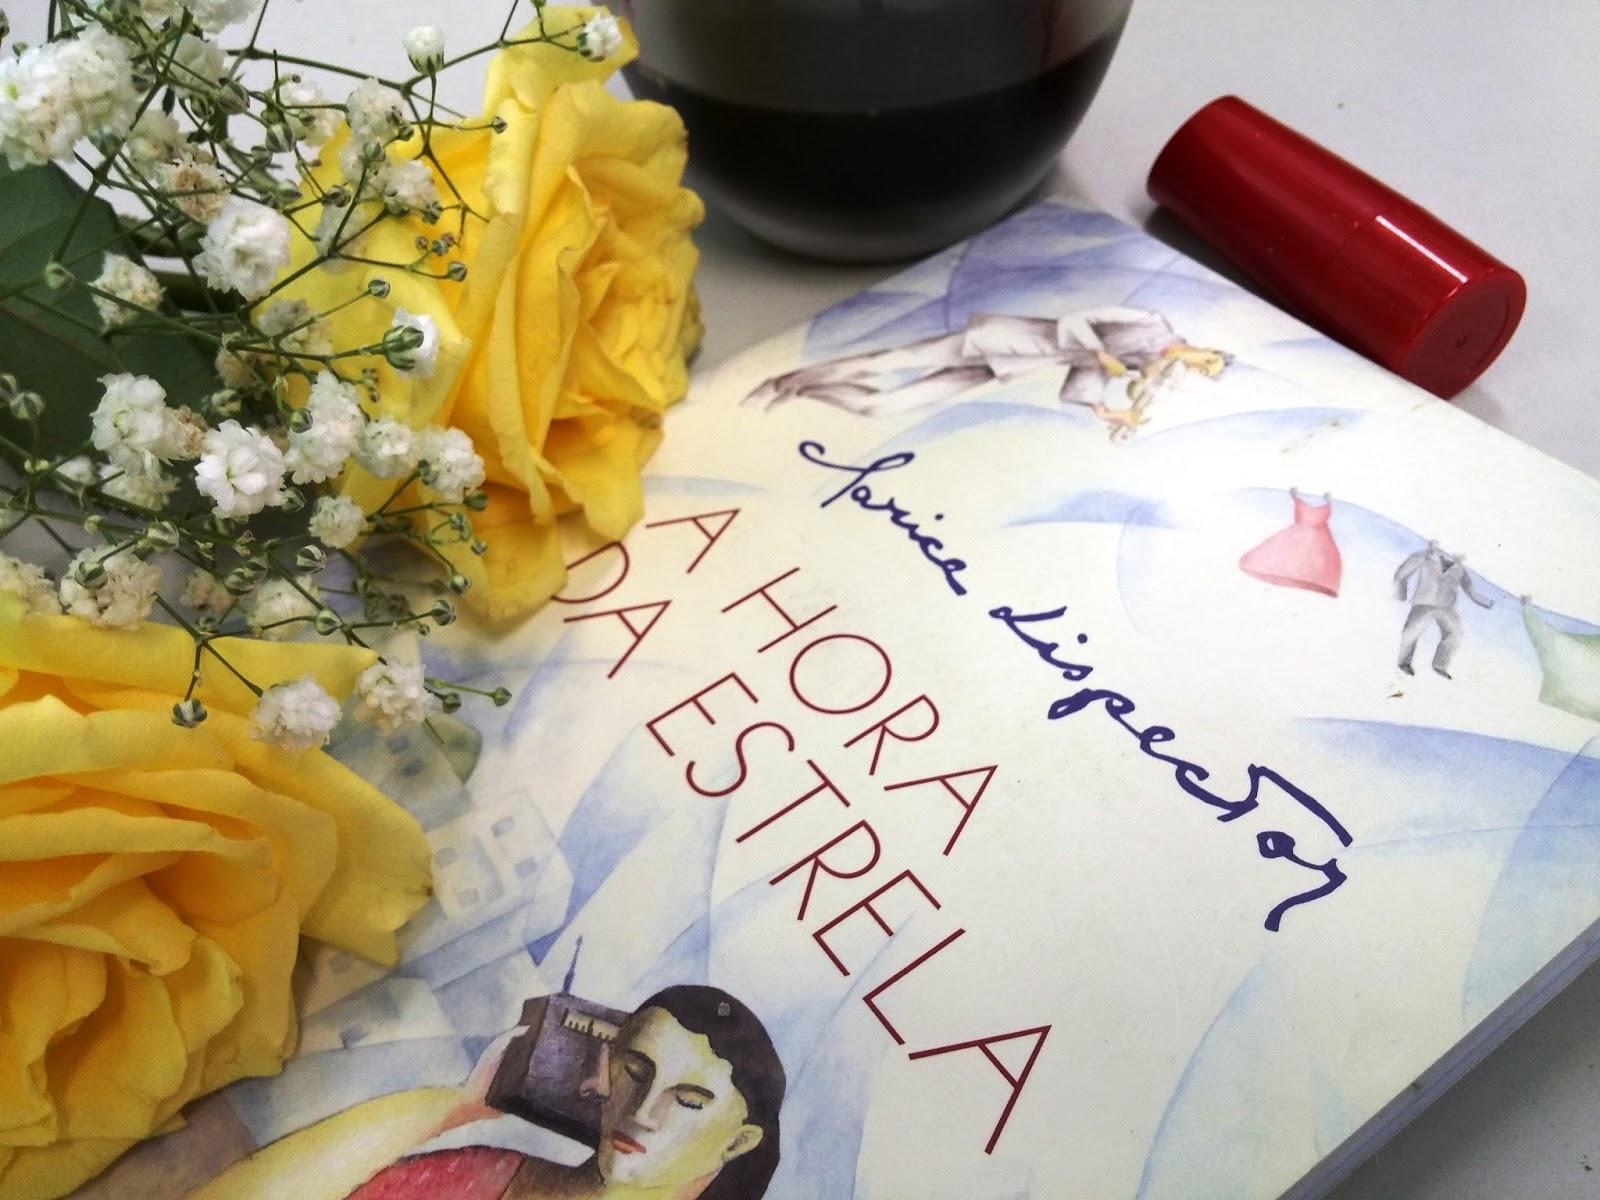 Literatura A Hora Da Estrela Frases Soltas